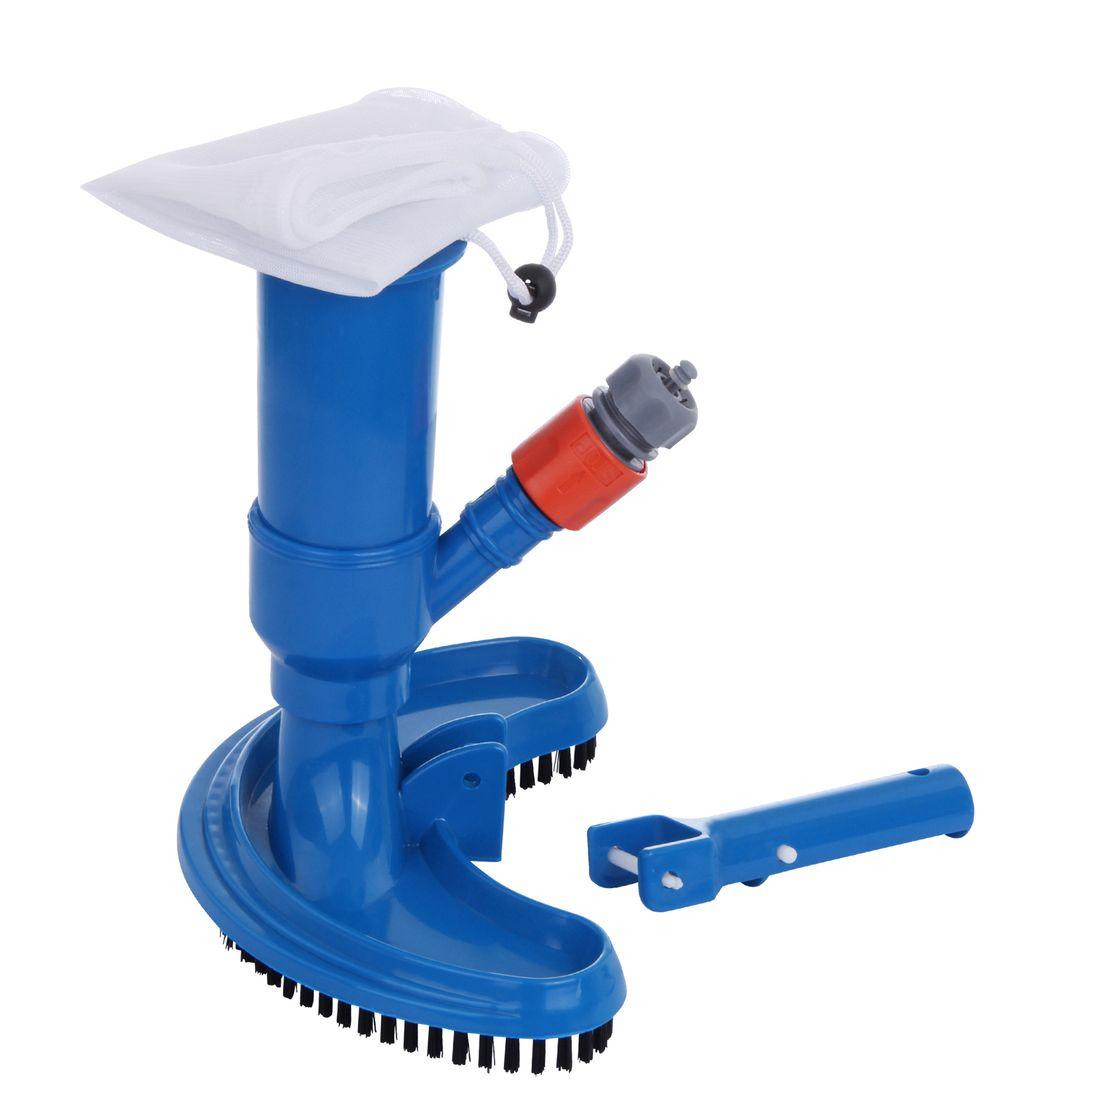 blueborn swimming pool vacuum cleaner jv-c venturi garden hose suction  brush + collecting bag watersport & pools pools & spas care & cleaning